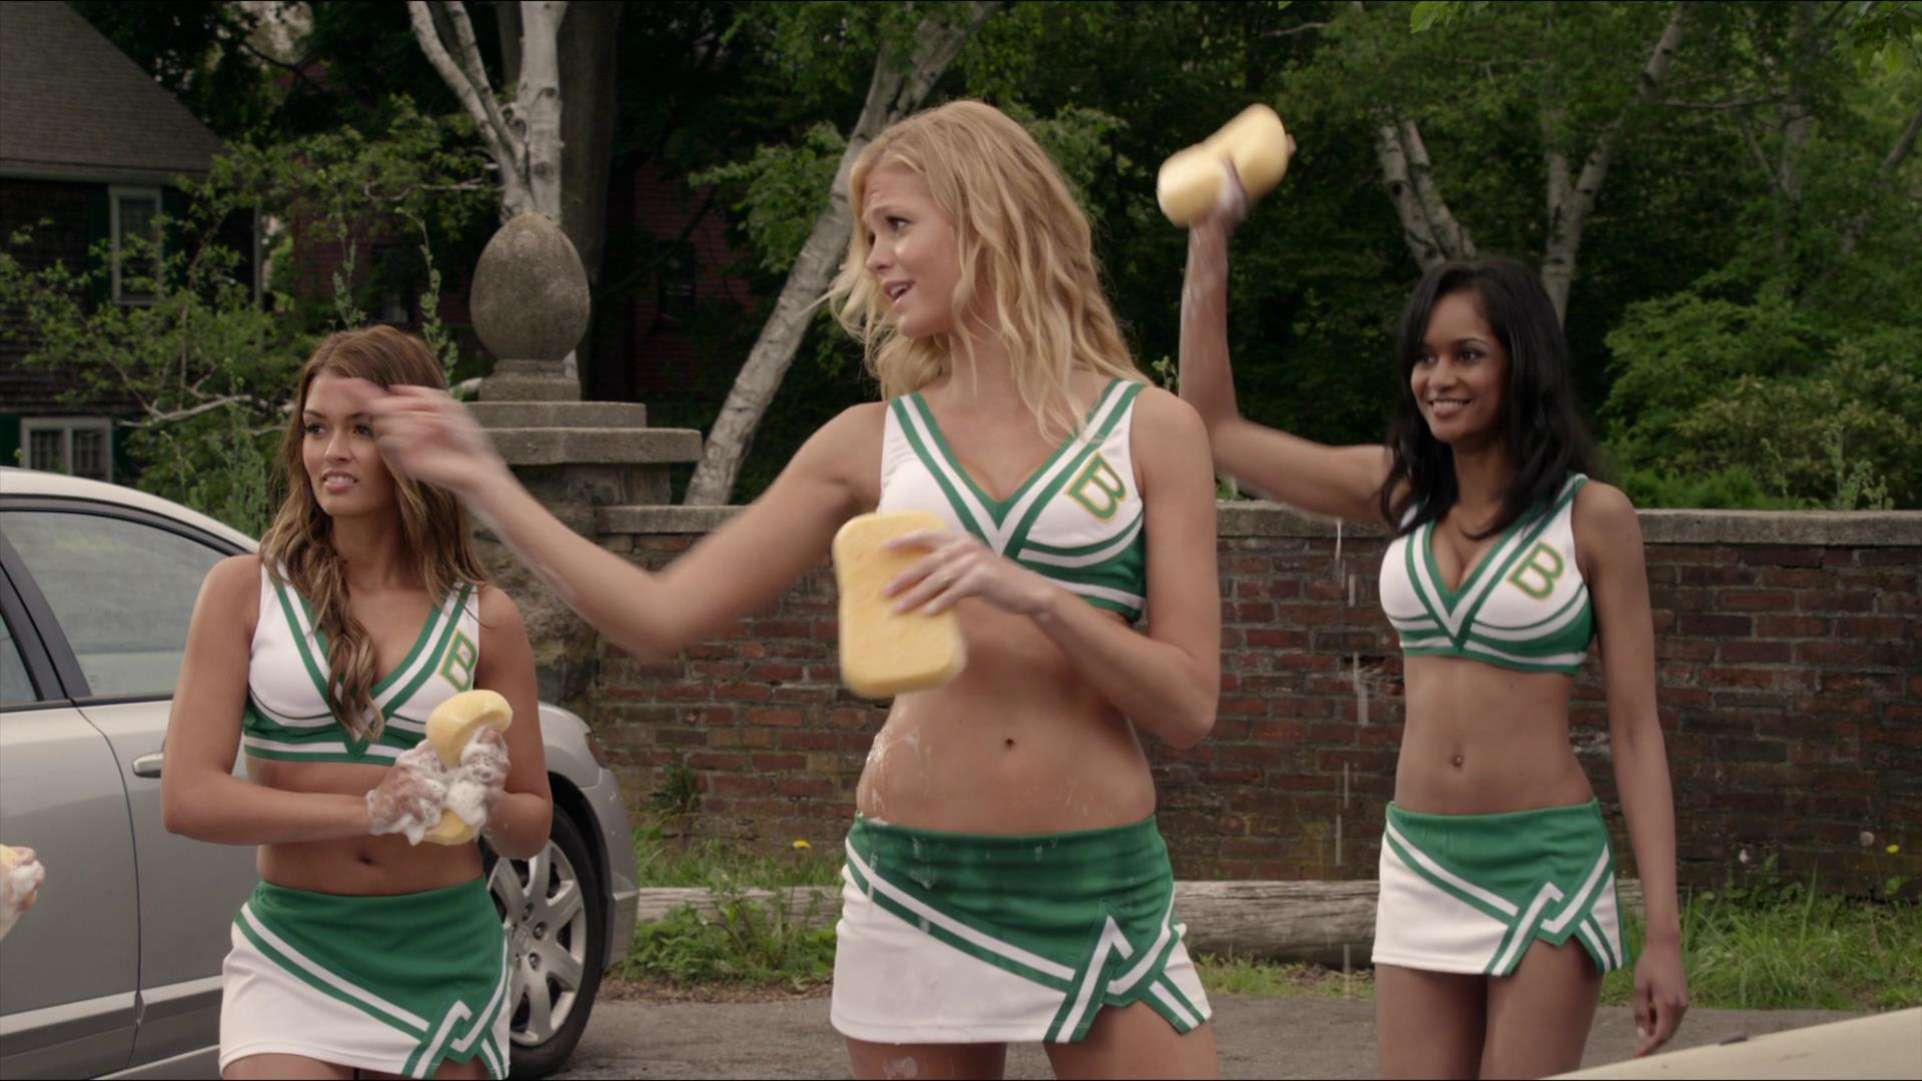 Erin Heatherton 2013 : Erin Heatherton Hot in Grown Ups 2-14